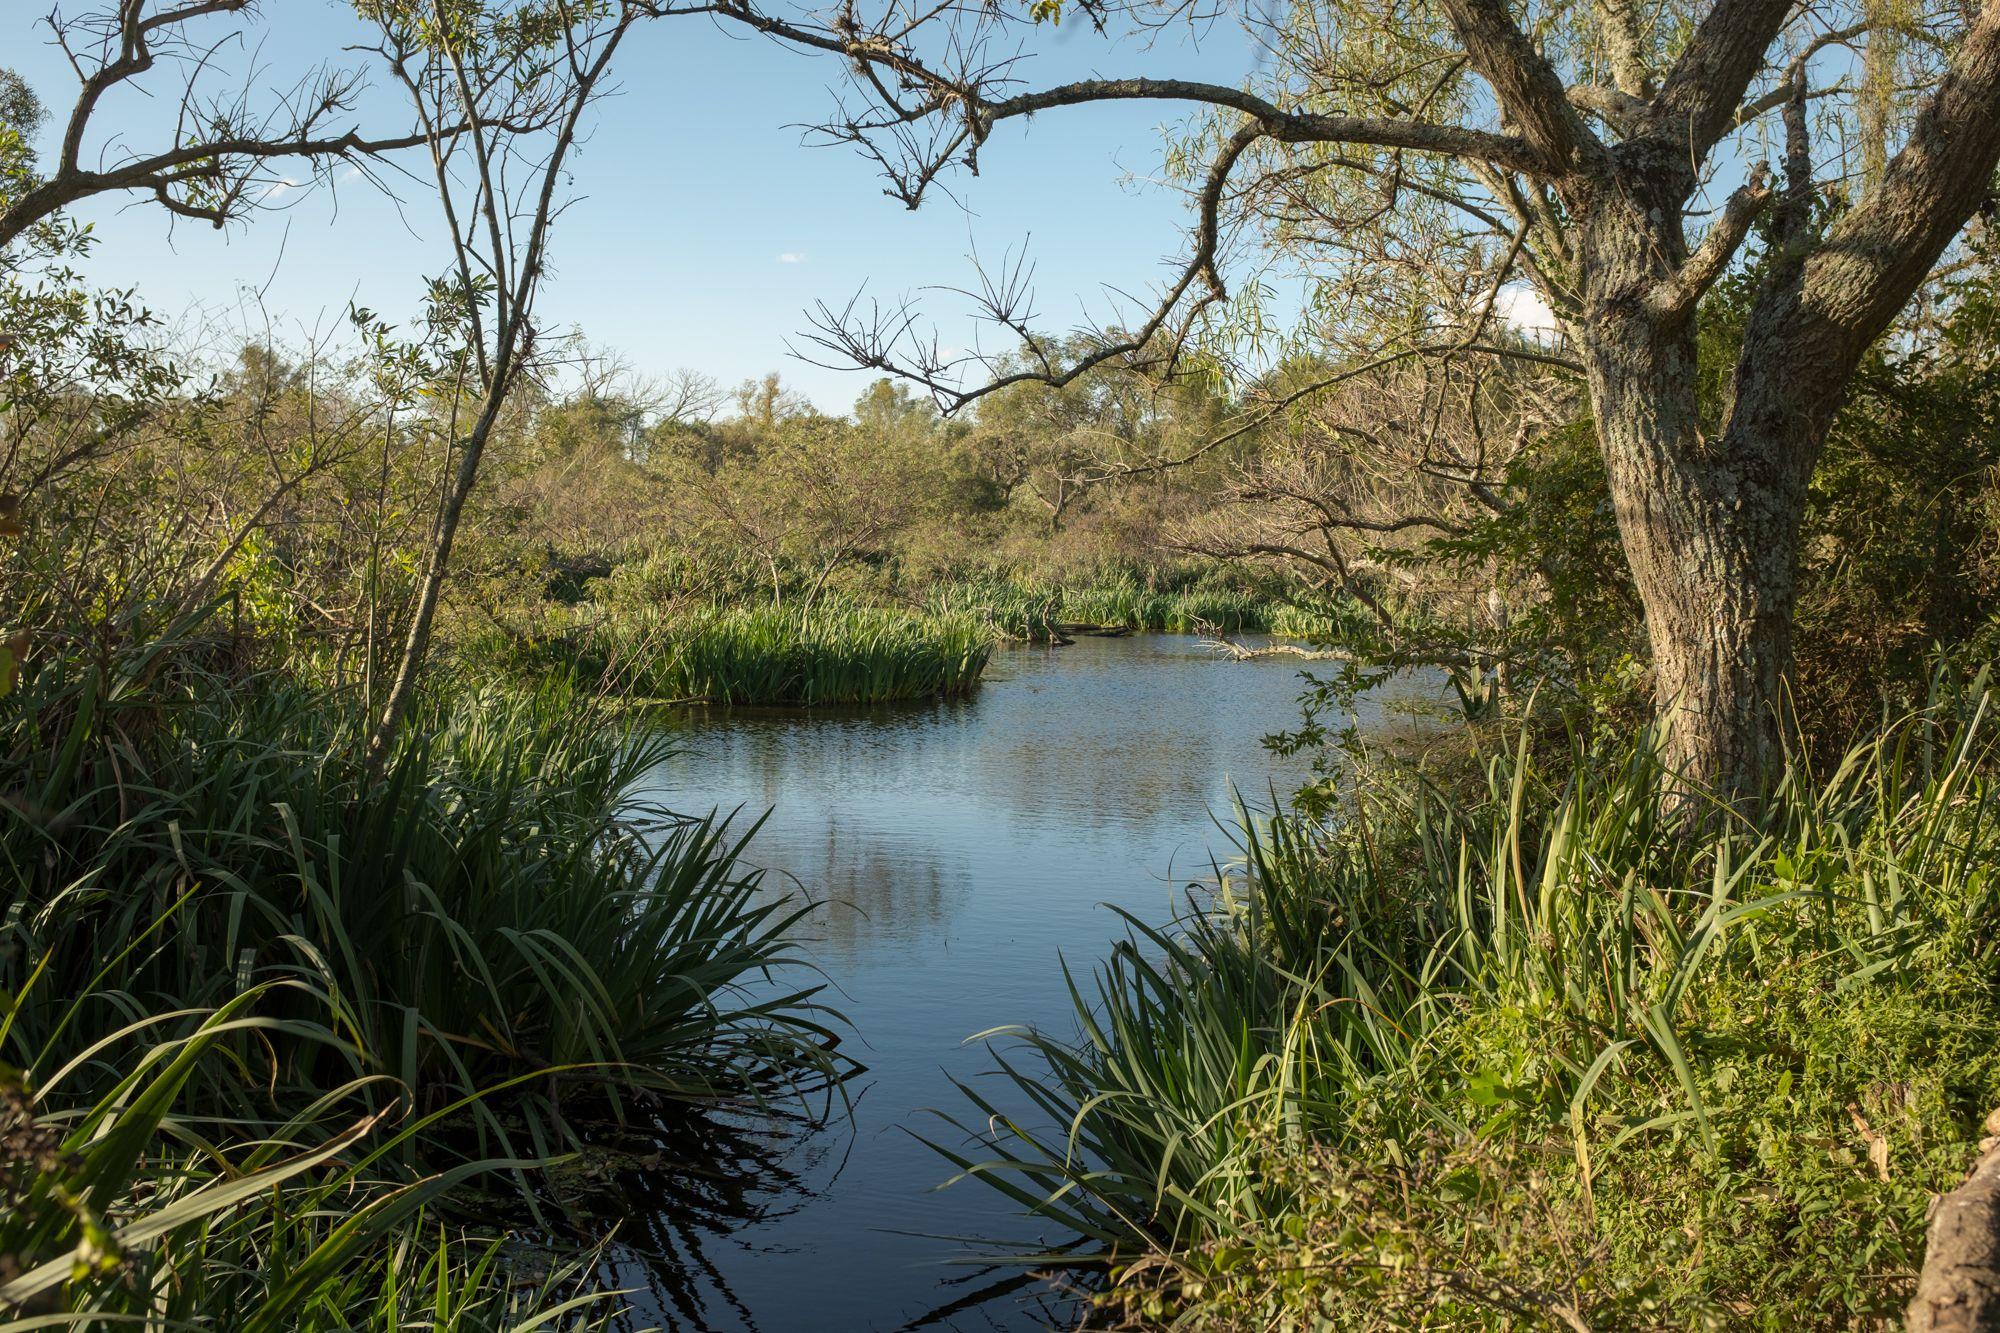 Ribera del Río de la Plata - Parque Natural Rivera Norte #03